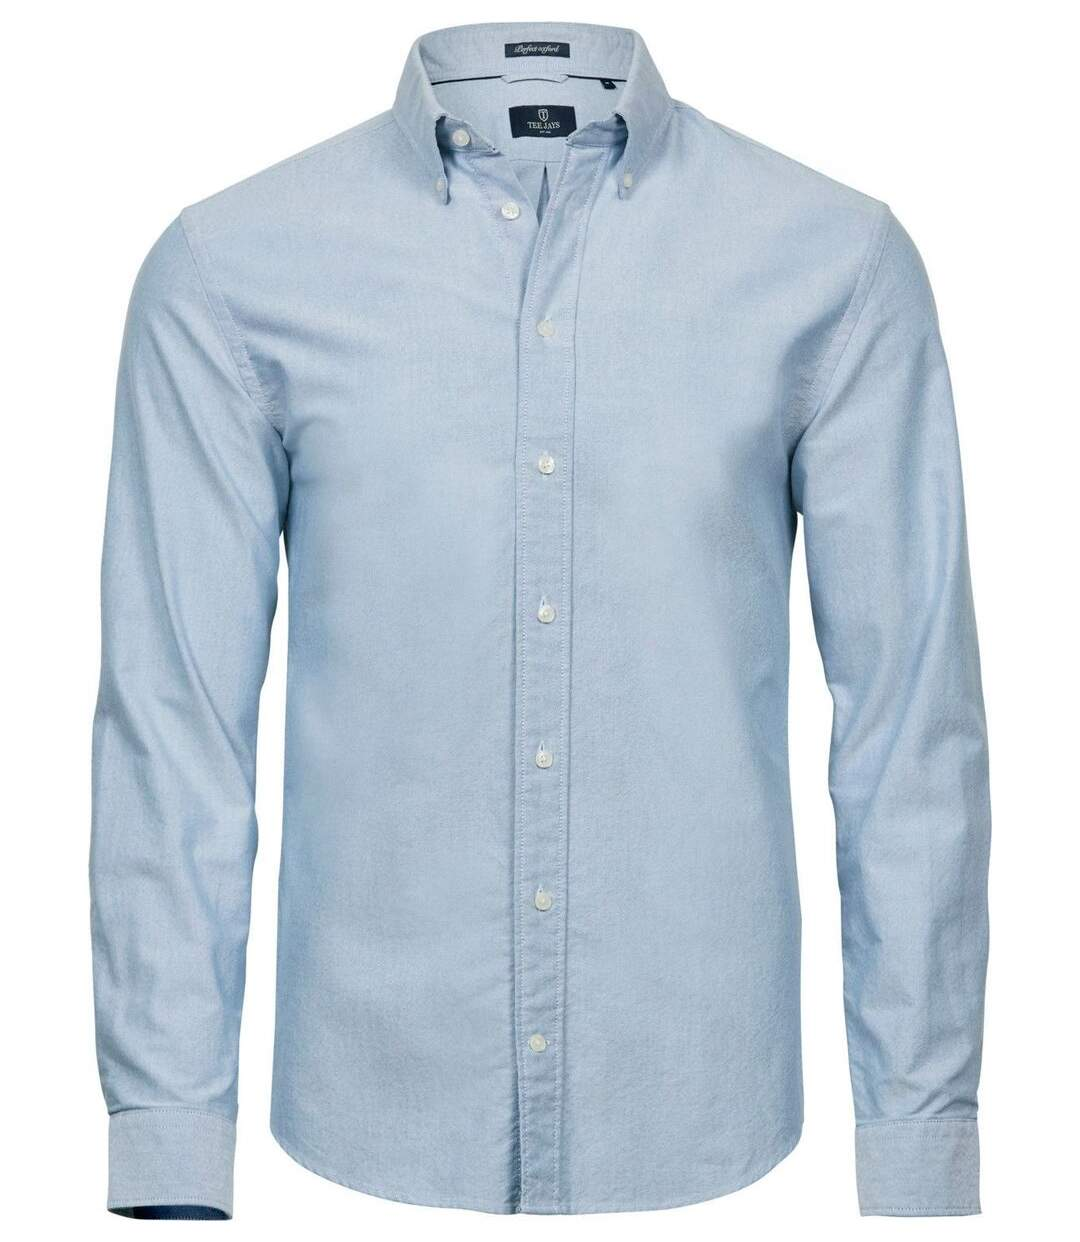 Chemise homme Oxford - 4000 - bleu clair - manches longues